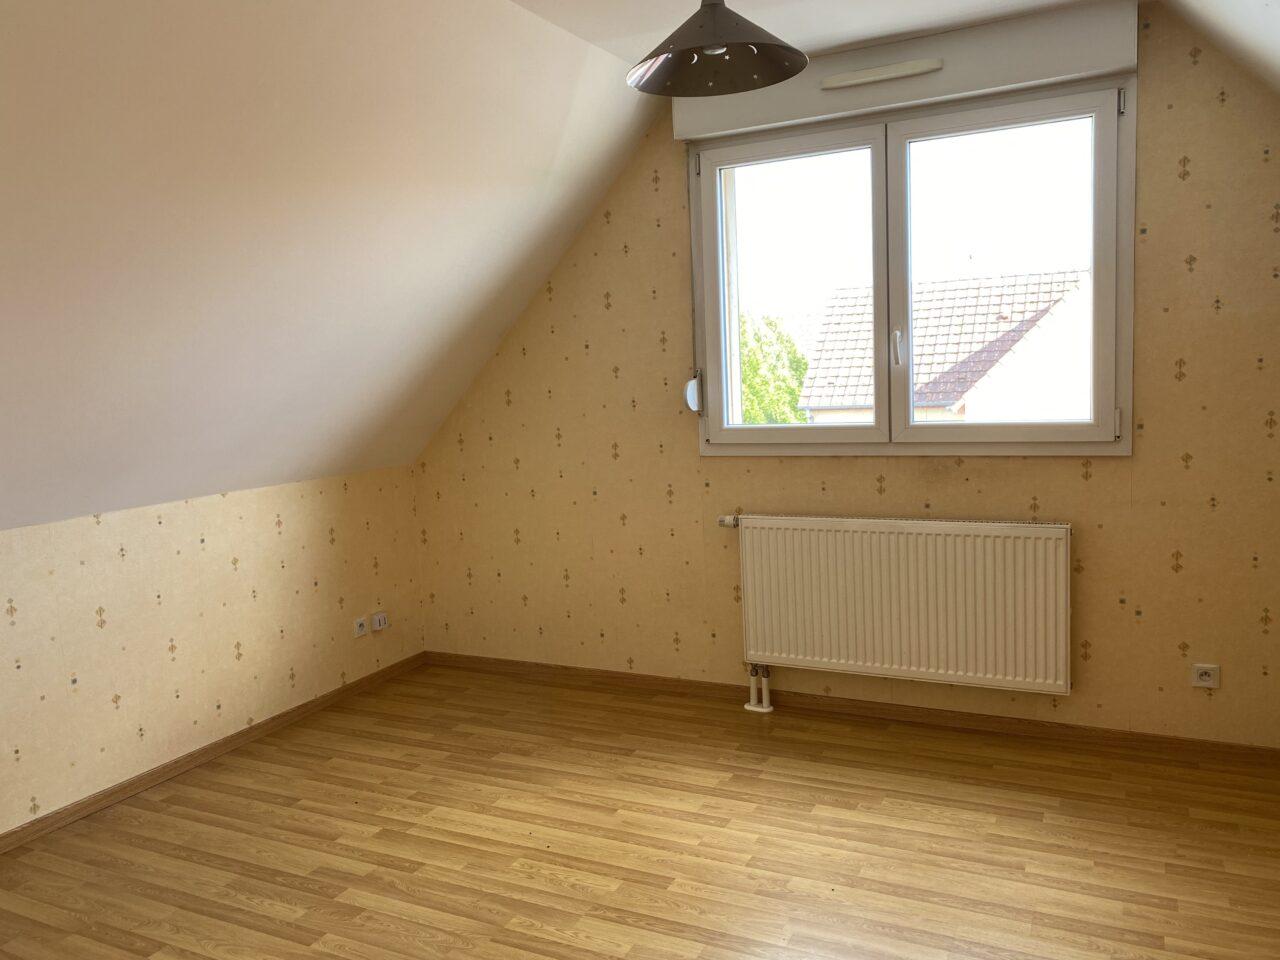 Rountzenheim duplex 5 pièces 91m2 terrasse garage. Vidéo disponible